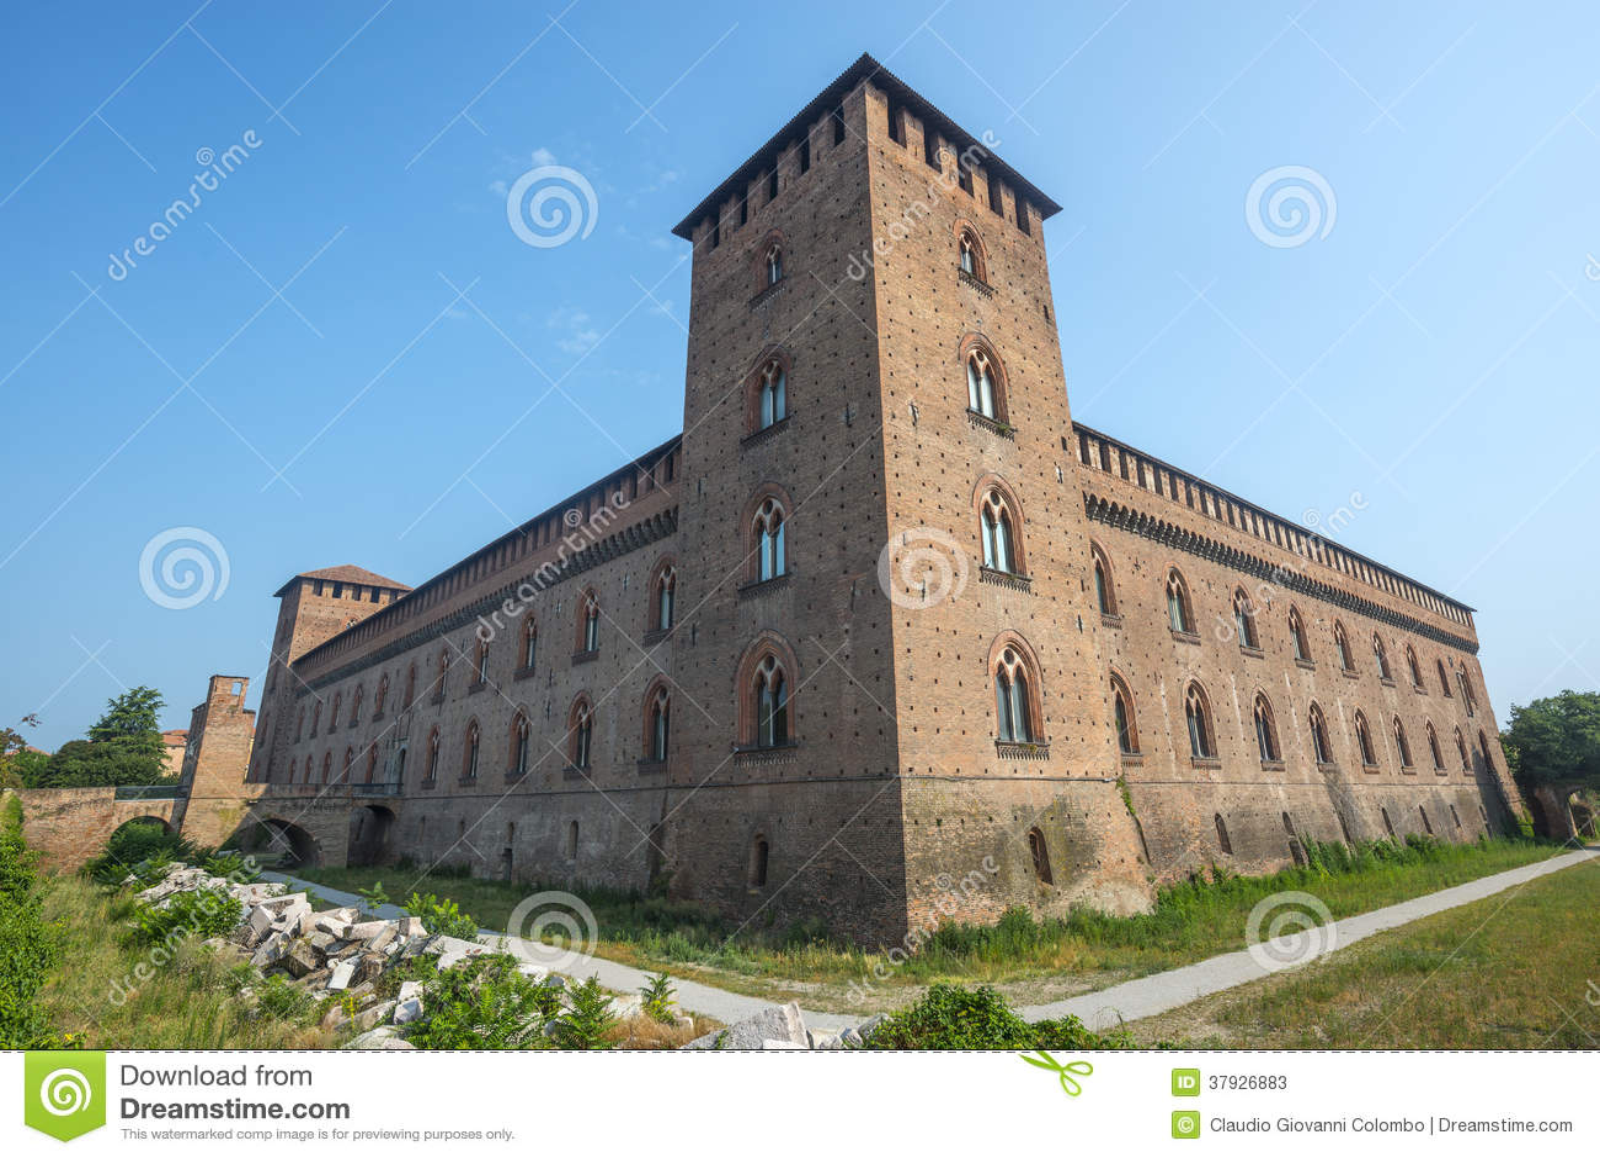 Pavia slott